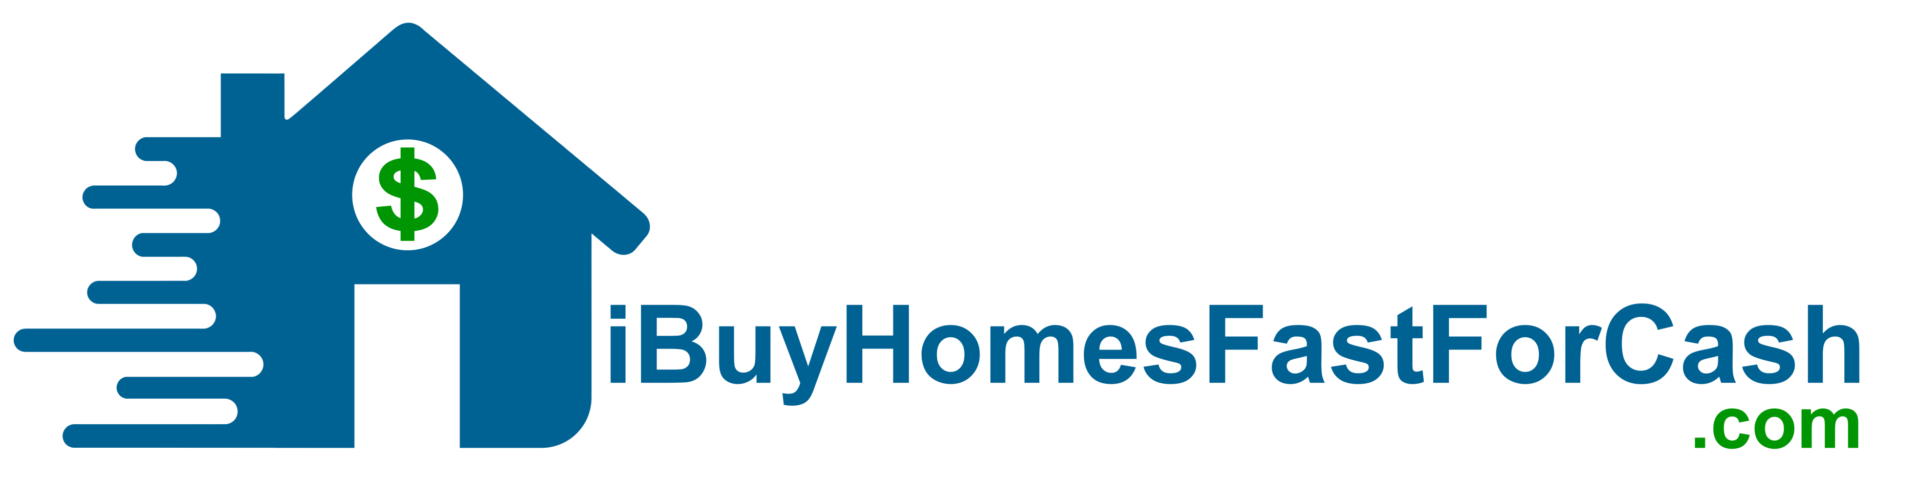 I Buy Homes Fast For Cash logo